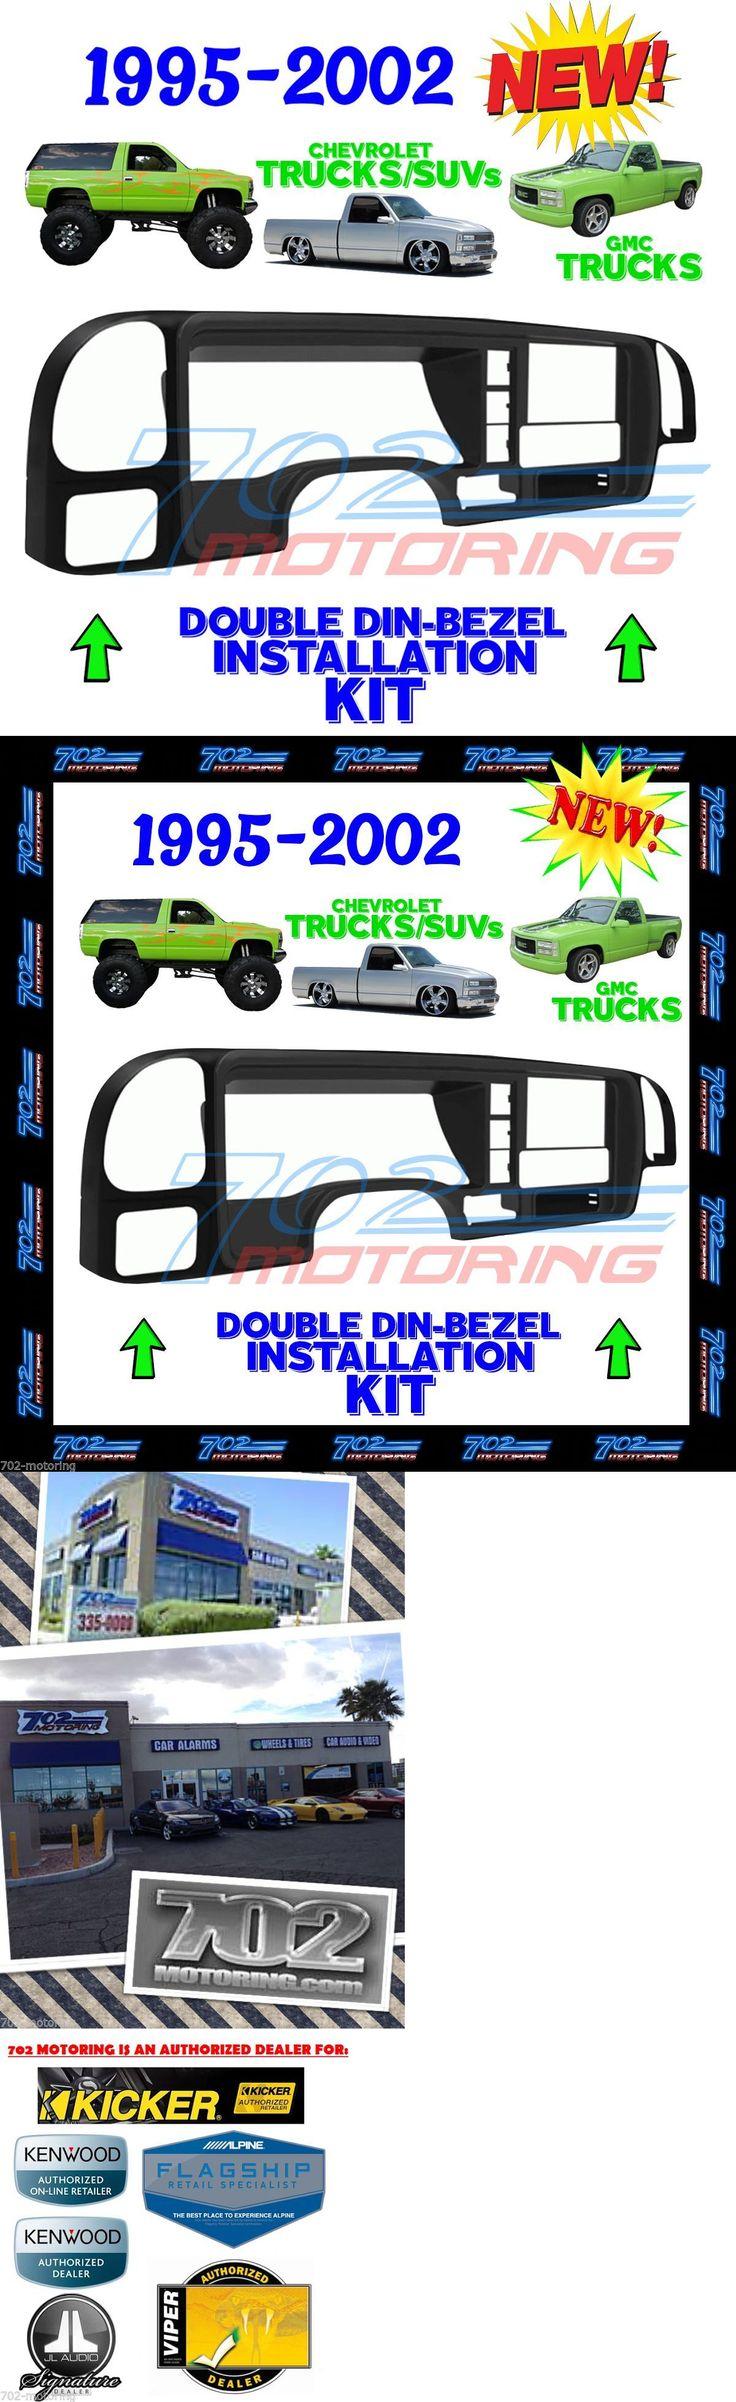 Dashboard Installation Kits: 1995 -2002 Silverado Gmc Sierra Car Stereo Radio Double Din Install Dash Kit -> BUY IT NOW ONLY: $158.88 on eBay!